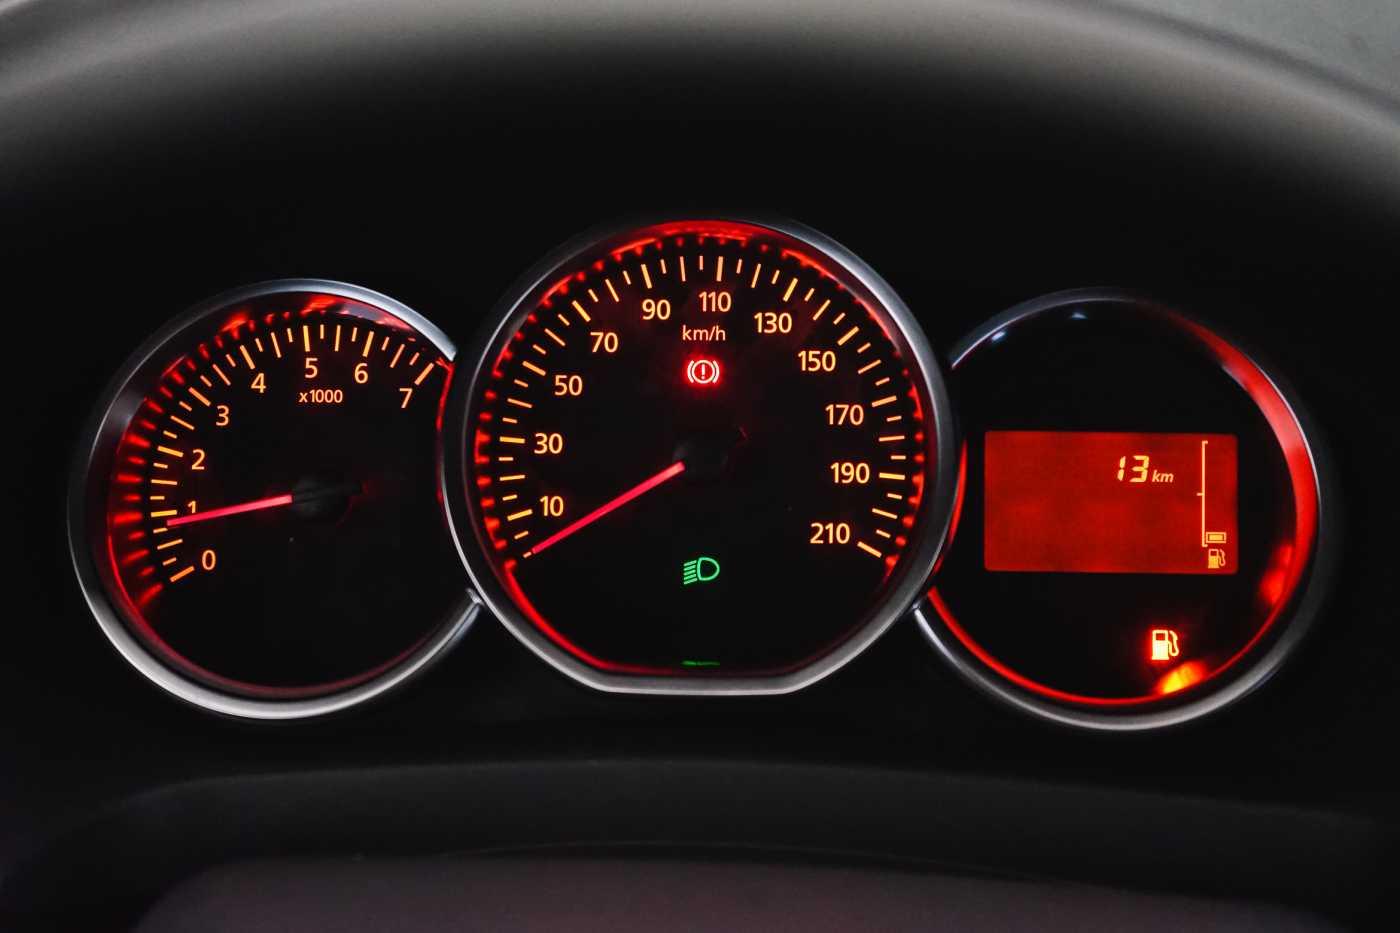 Dacia Sandero 1.0i SCe Stepway // Navi, Bluetooth, Airco, USB 22/27